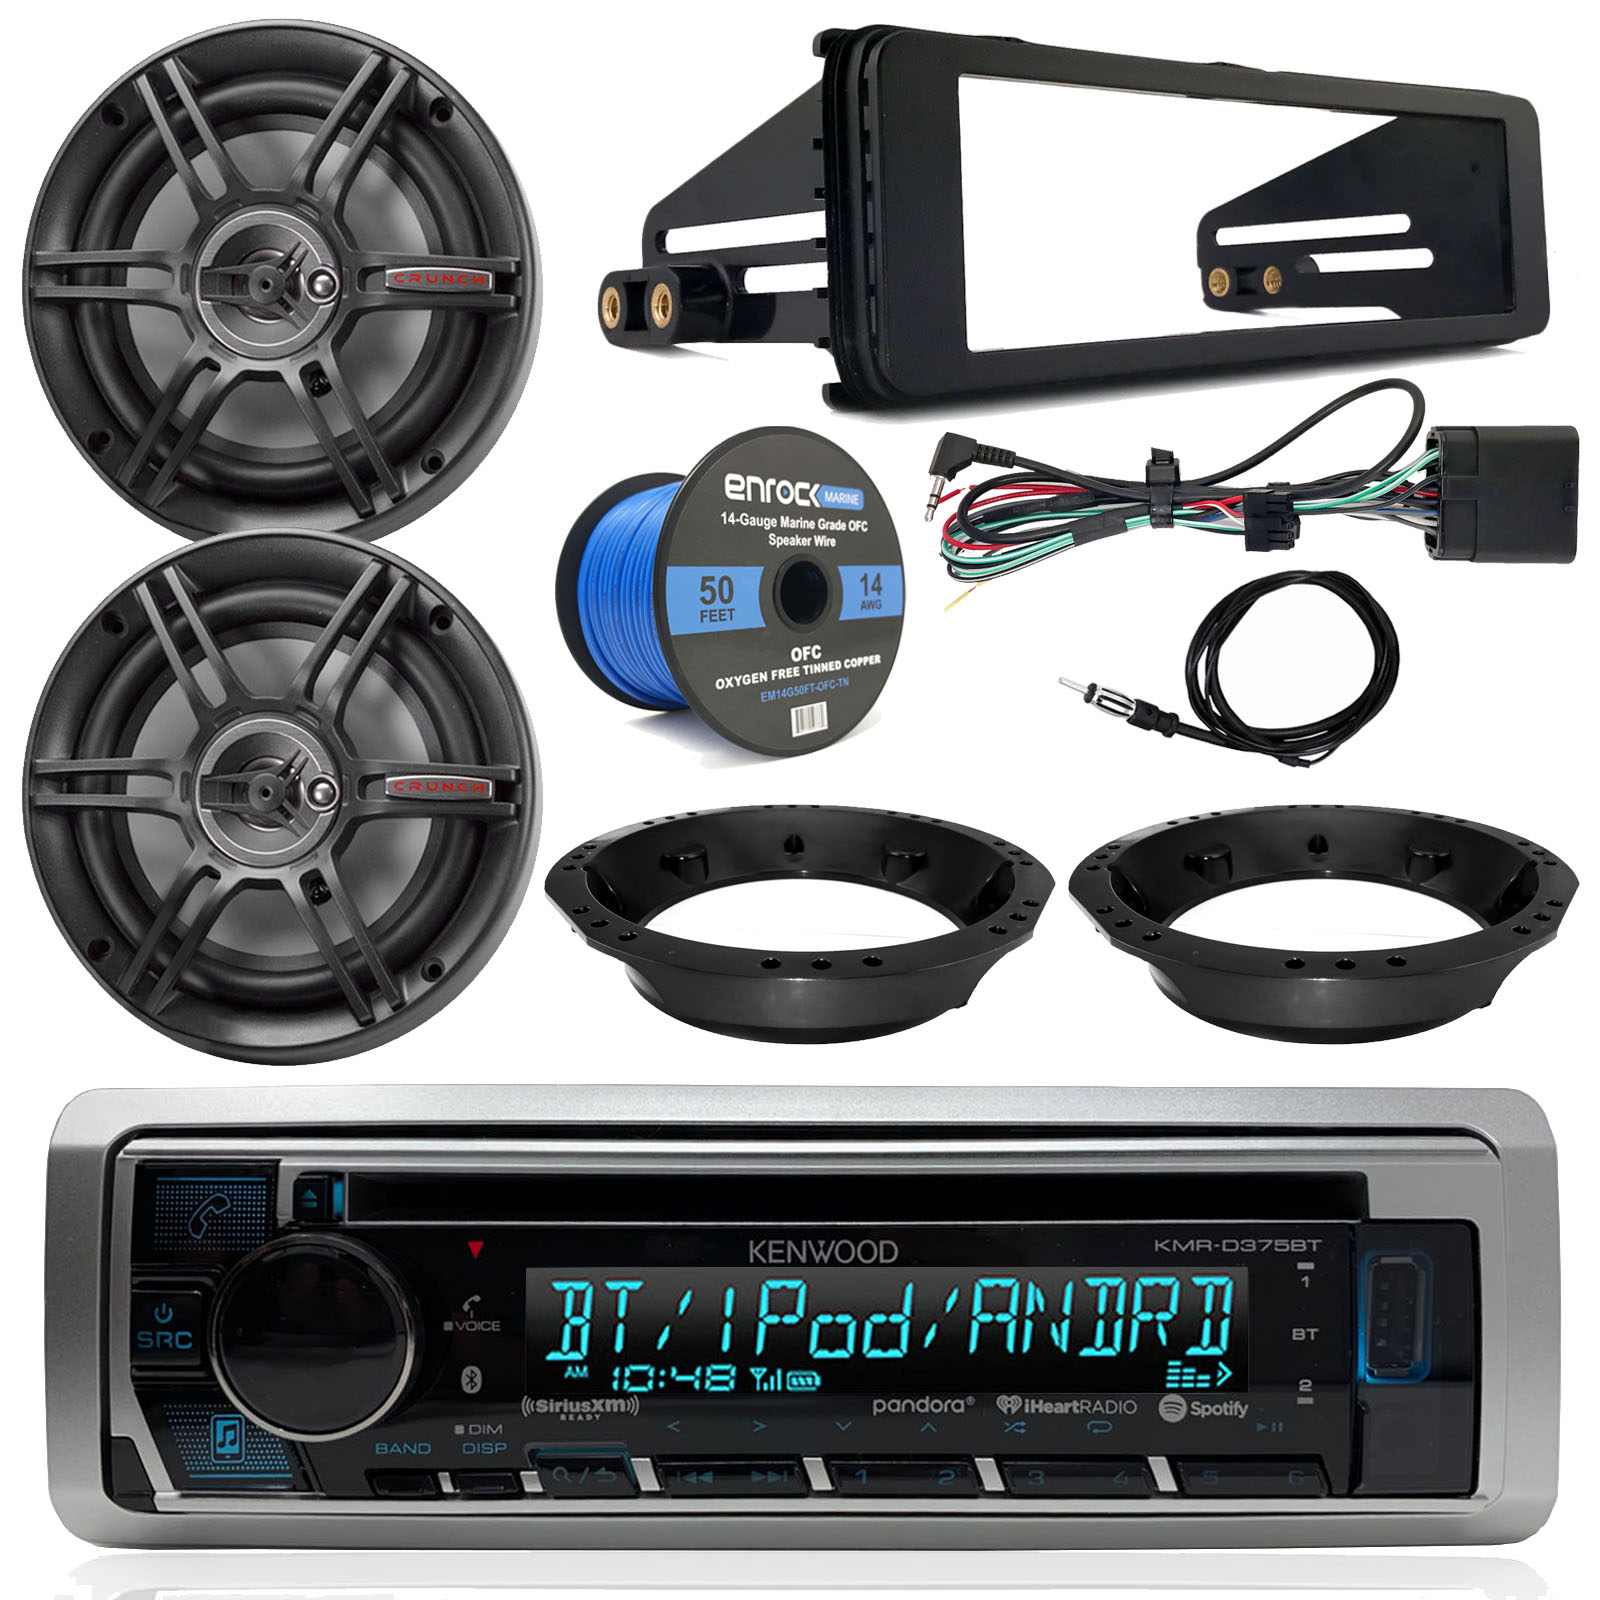 hight resolution of kenwood cd bluetooth marine stereo radio 2x crunch 6 5 speakers dash radio install kit speaker adapters 14 gauge speaker wire antenna 98 13 harley